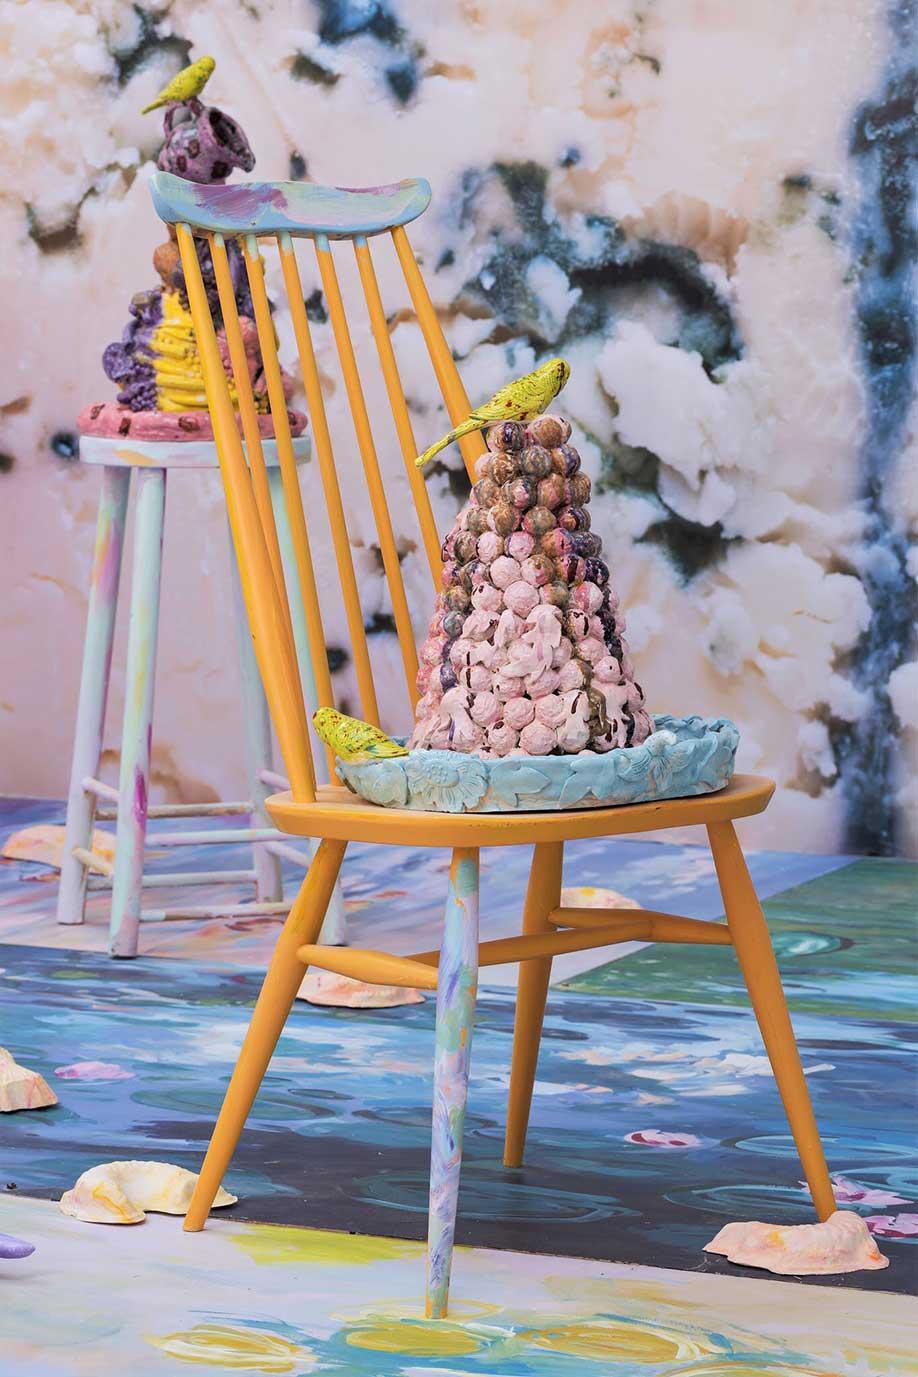 <b>Title:</b>Clever Girl (detail)<br /><b>Year:</b>2017<br /><b>Medium:</b>Ceramic installation<br />